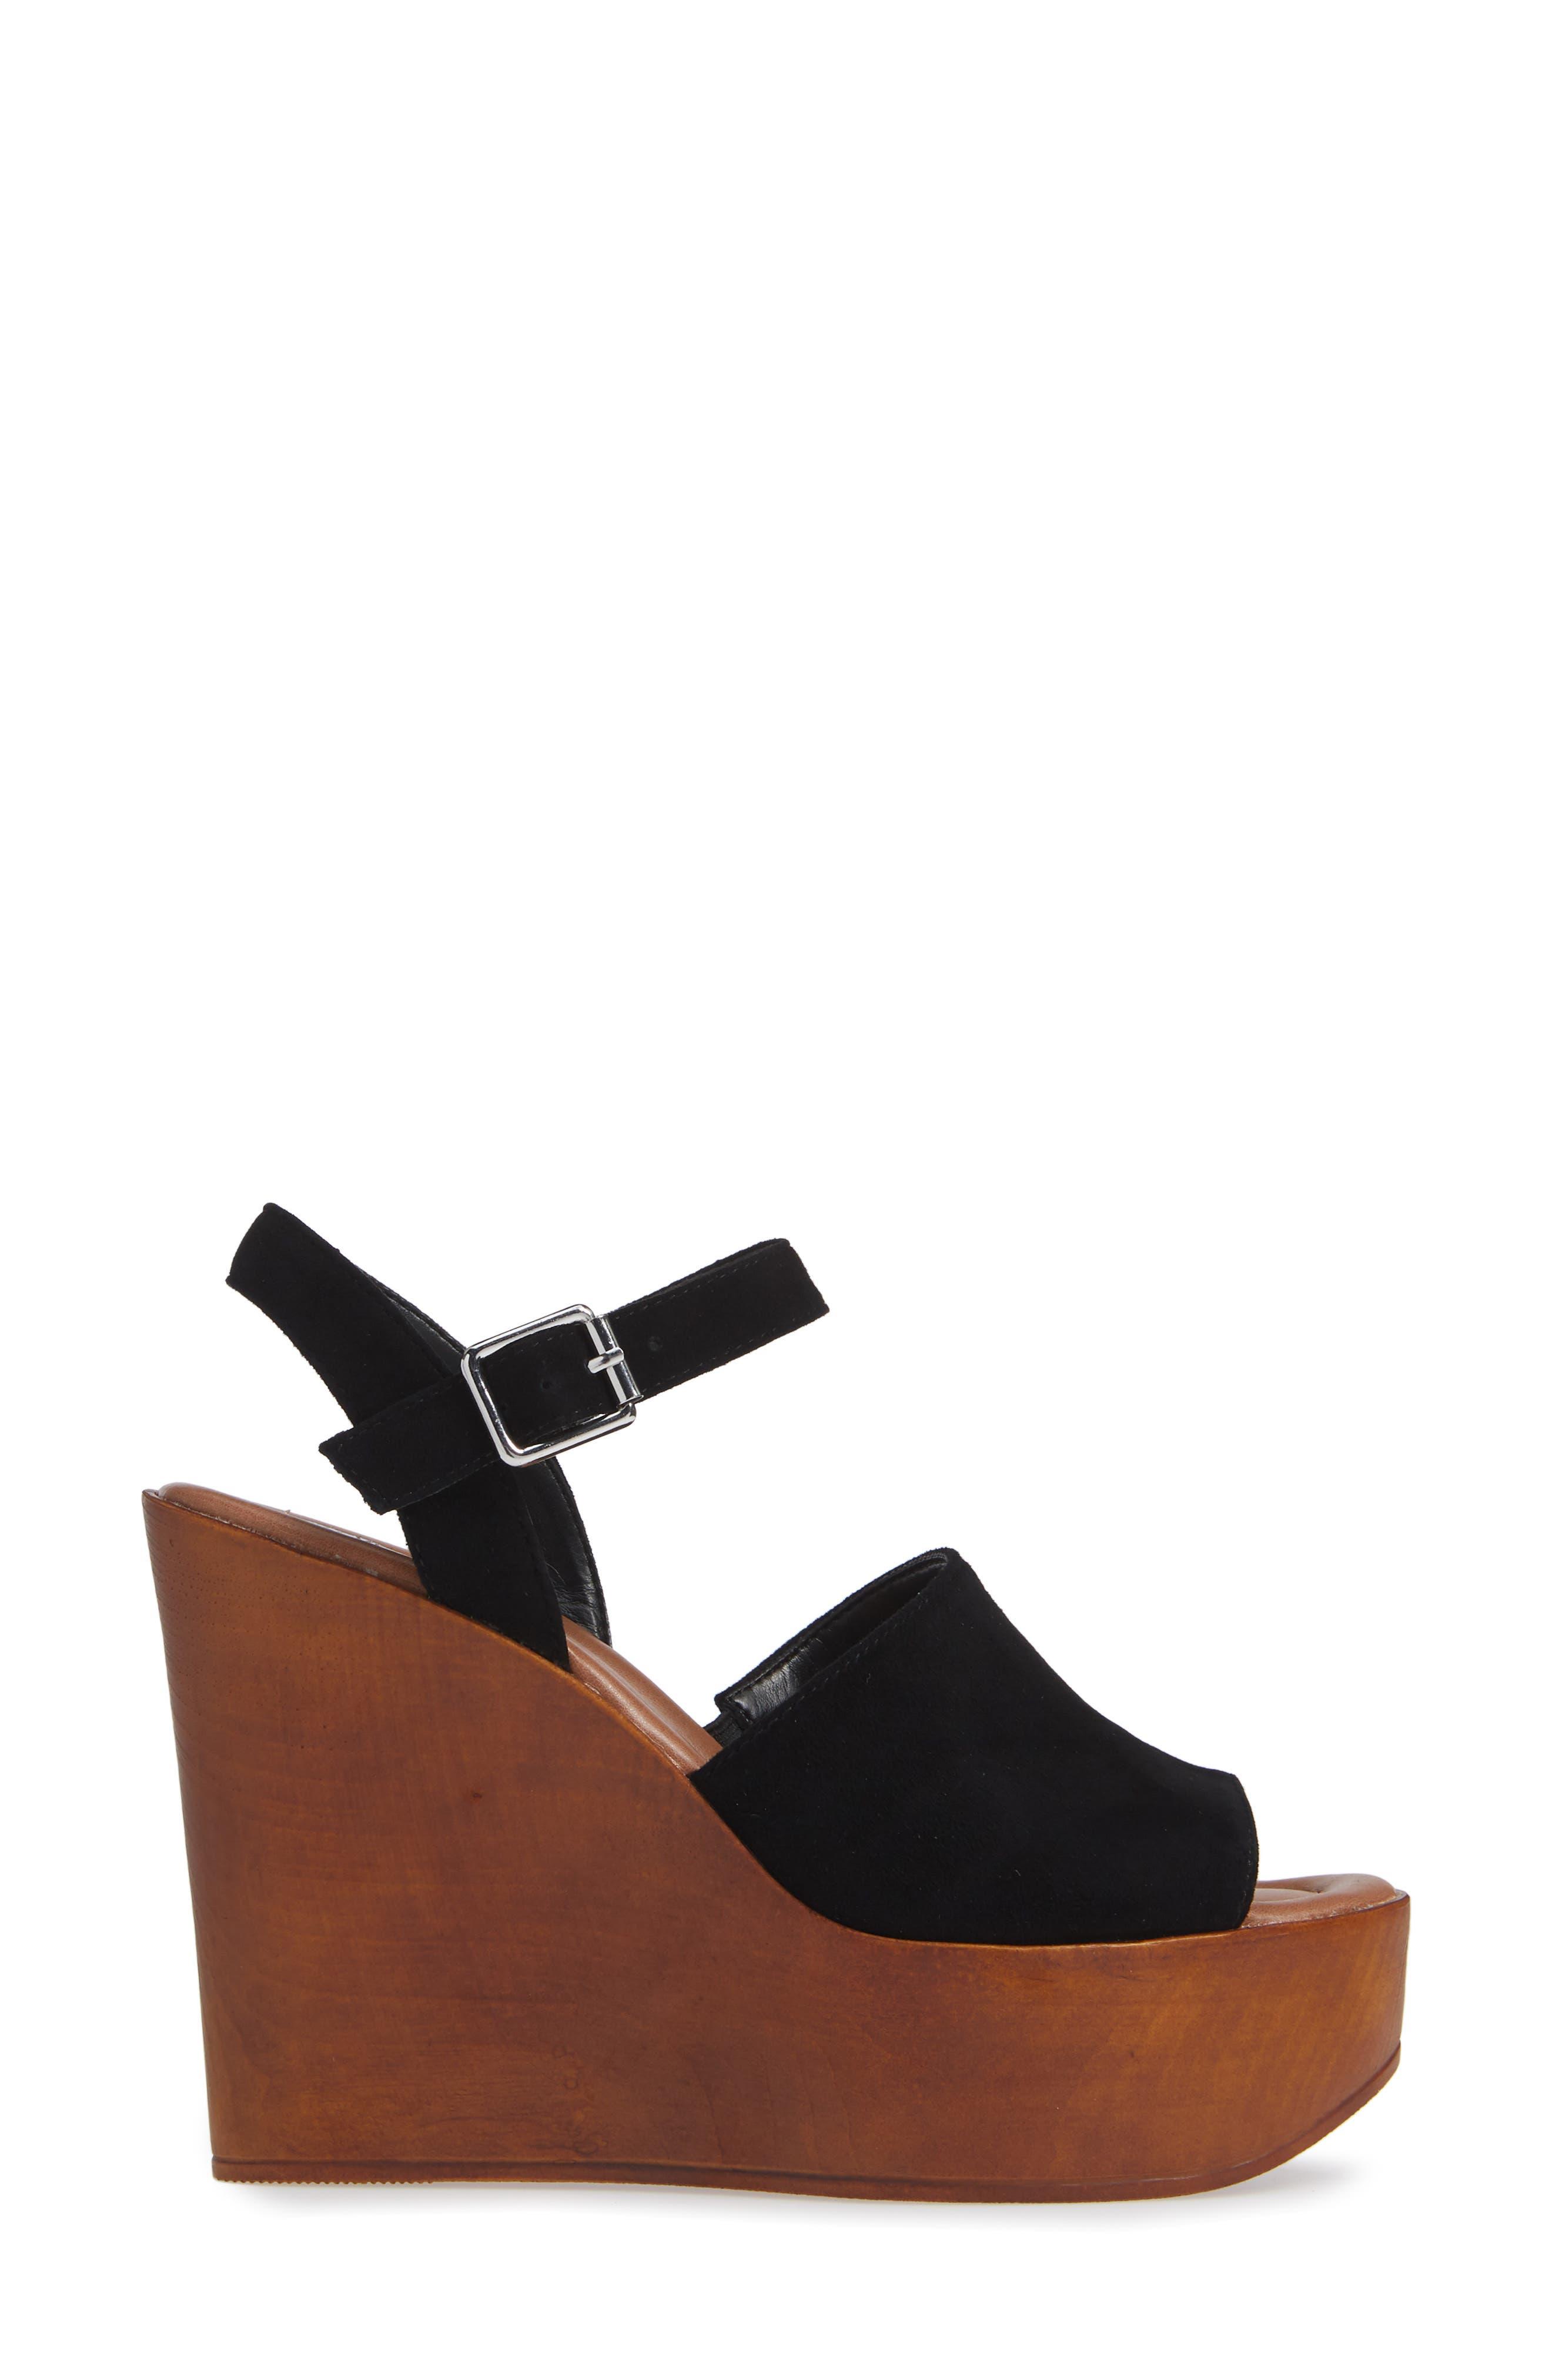 Bellini Wedge Sandal,                             Alternate thumbnail 3, color,                             BLACK SUEDE